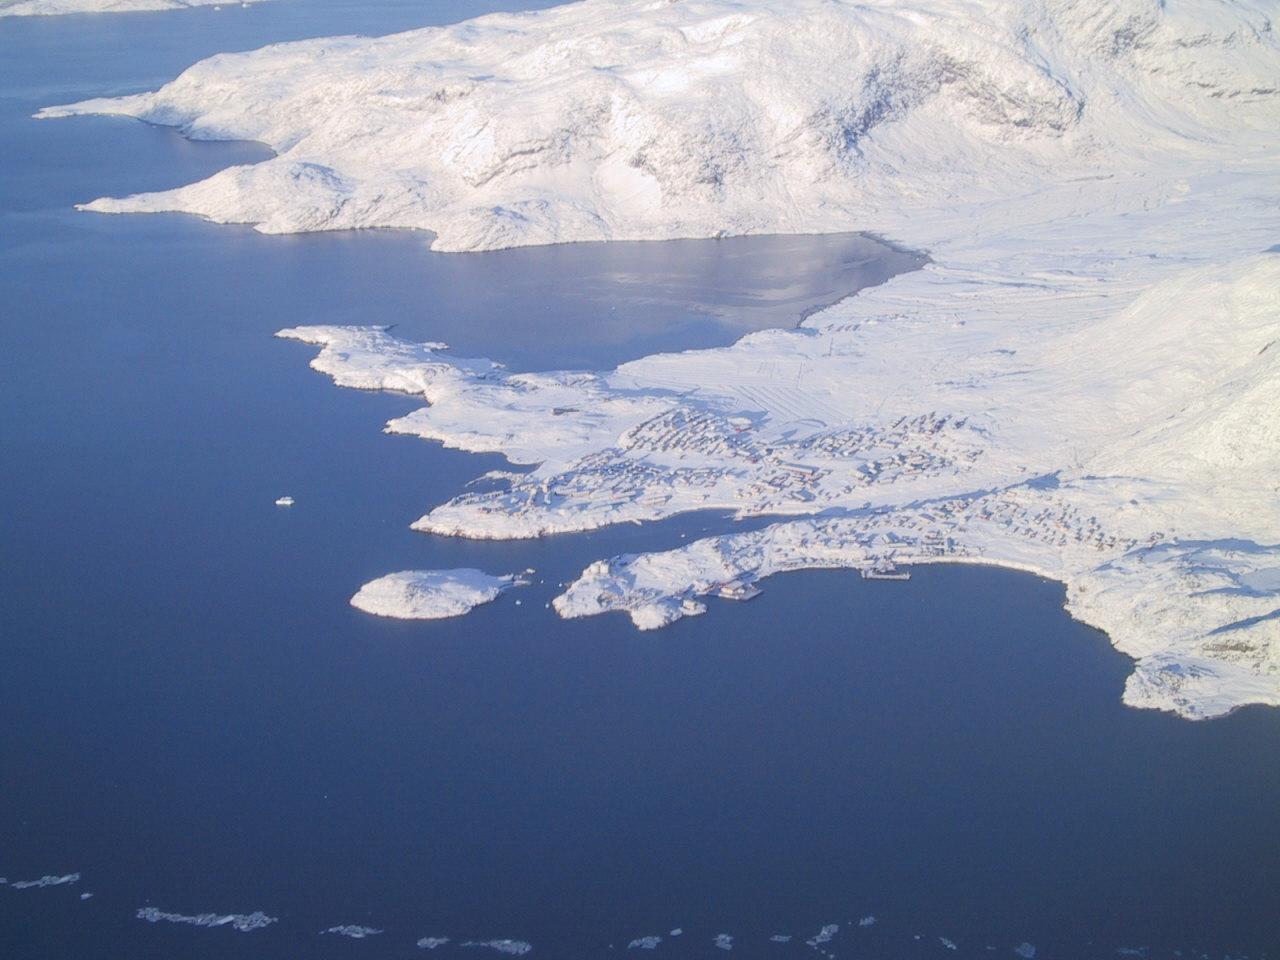 Bob Webster's photo of Narsarsuaq, Greenland